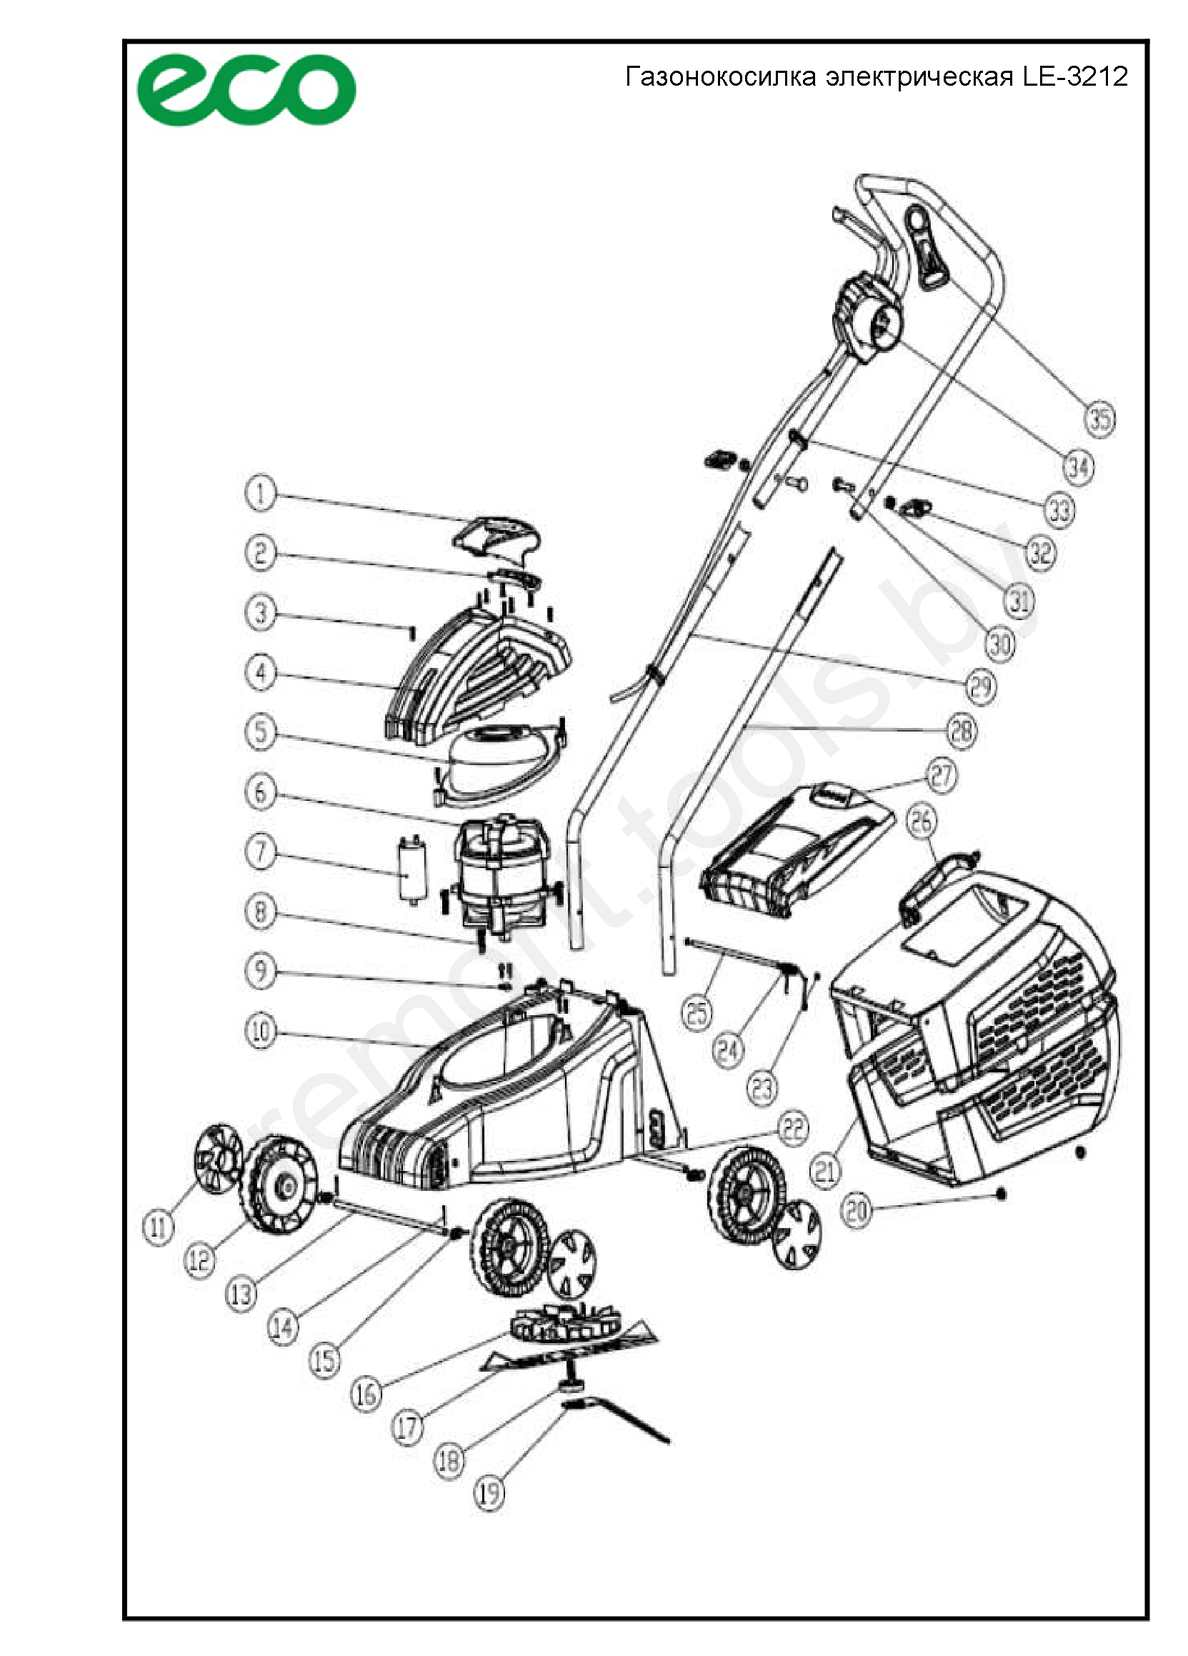 Eco Газонокосилка электрическая Le 3212